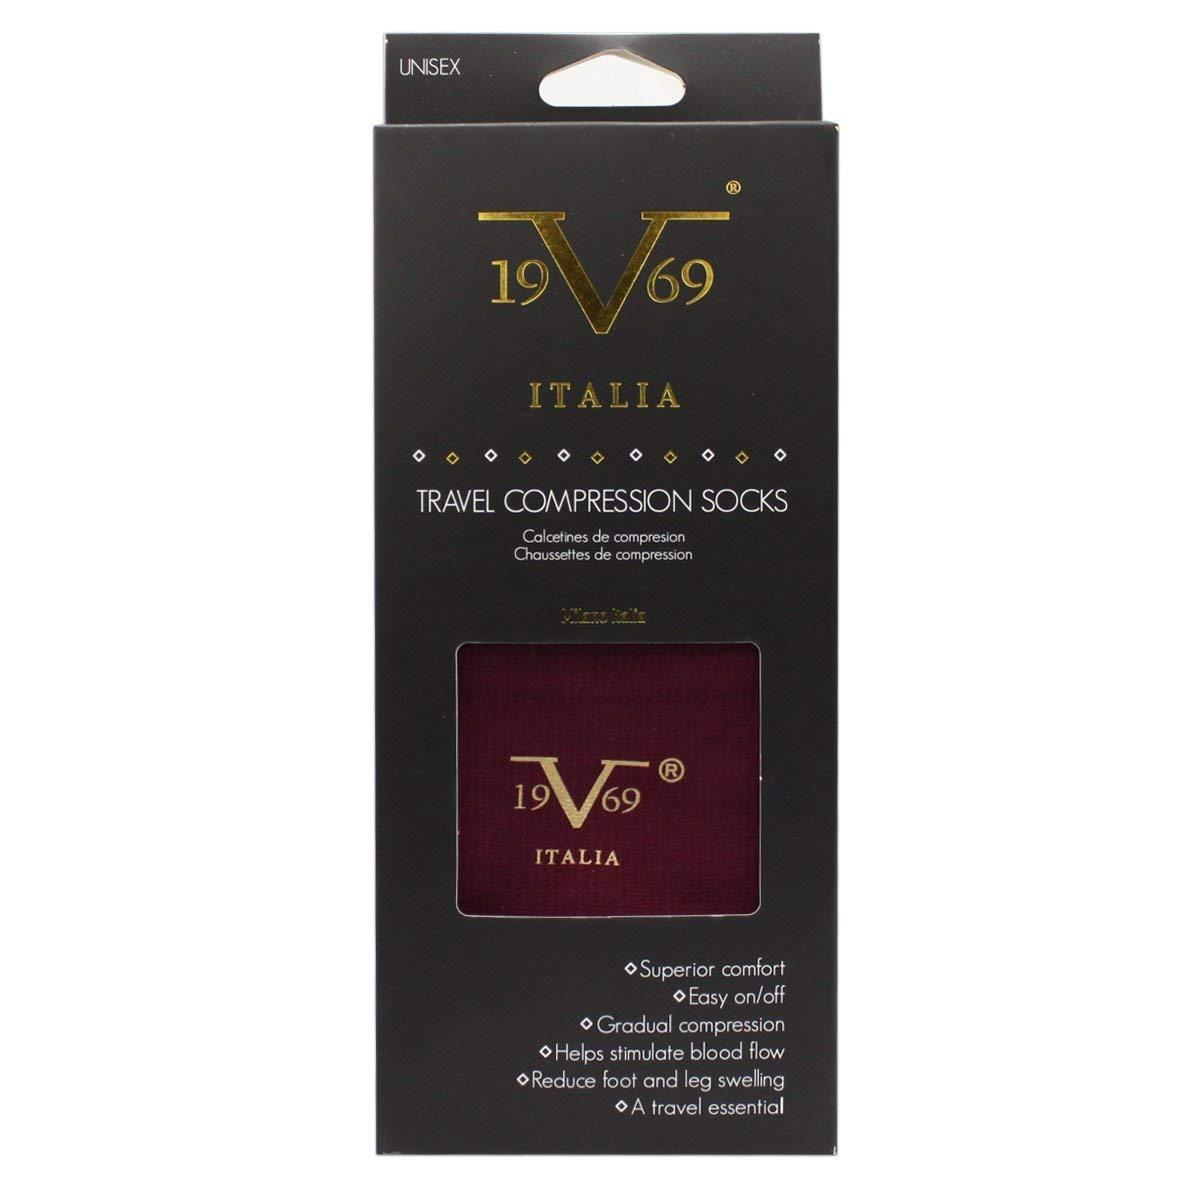 c53cd80da4 Amazon.com: Compression Socks - V19.69 Italia Best Socks for Travel,  Running, Athletes, Pregnancy, Medical, Varicose Veins, Edema, Diabetic -  Dark Red ...